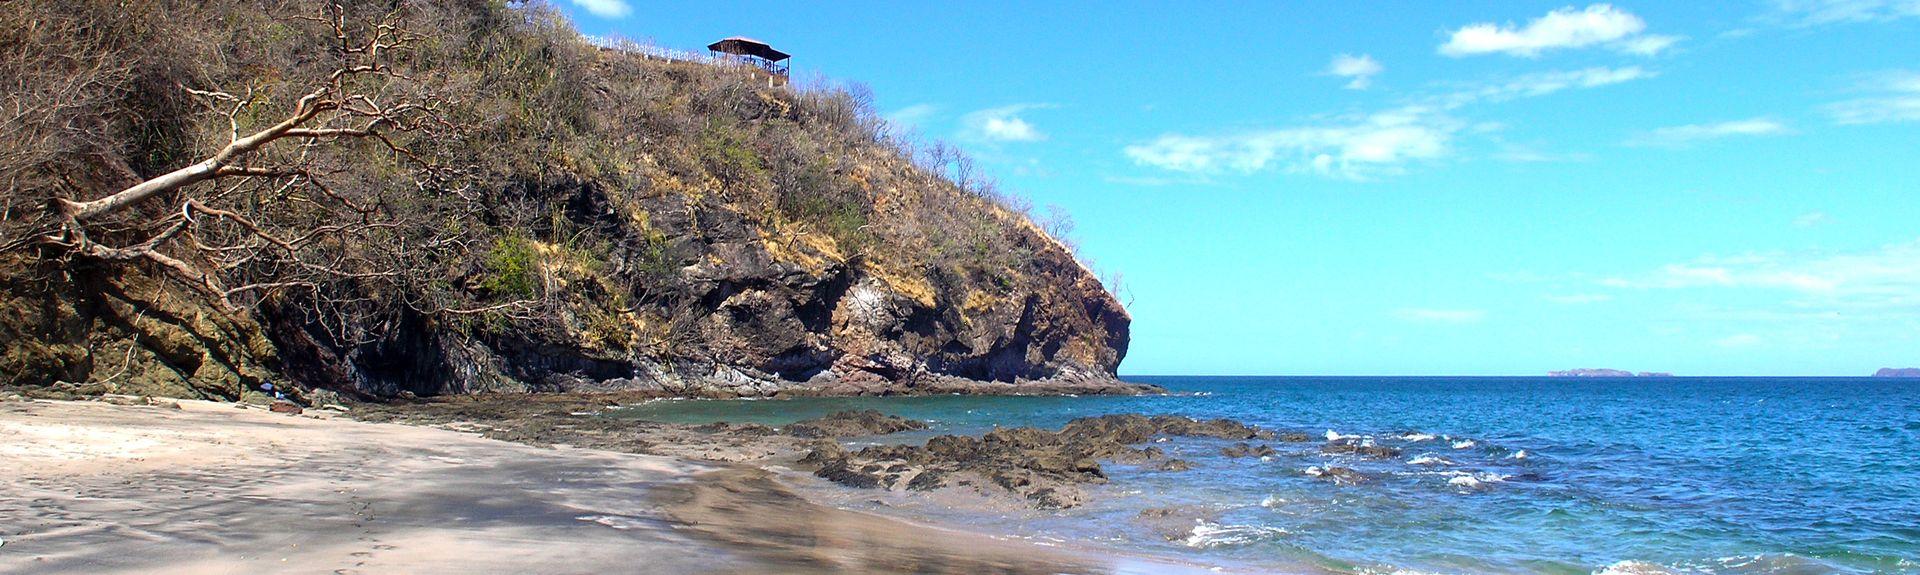 Flamingo Marina Resort (Playa Flamingo, Guanacaste, Costa Rica)